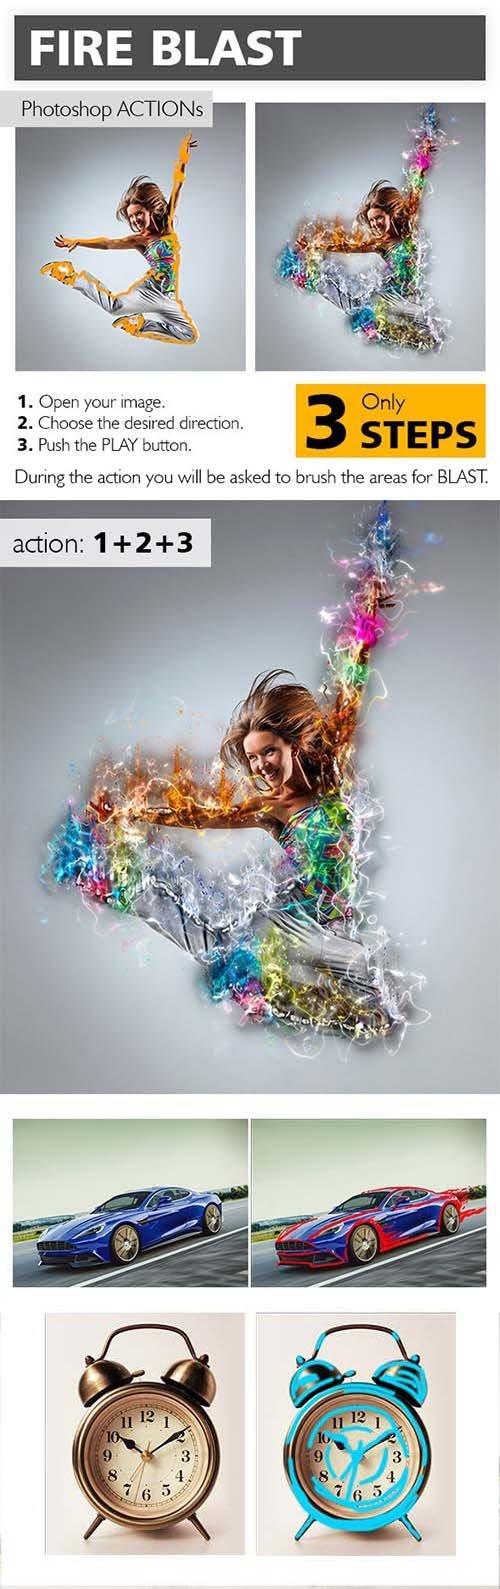 Graphicriver Fire Blast Photoshop Action 10658158